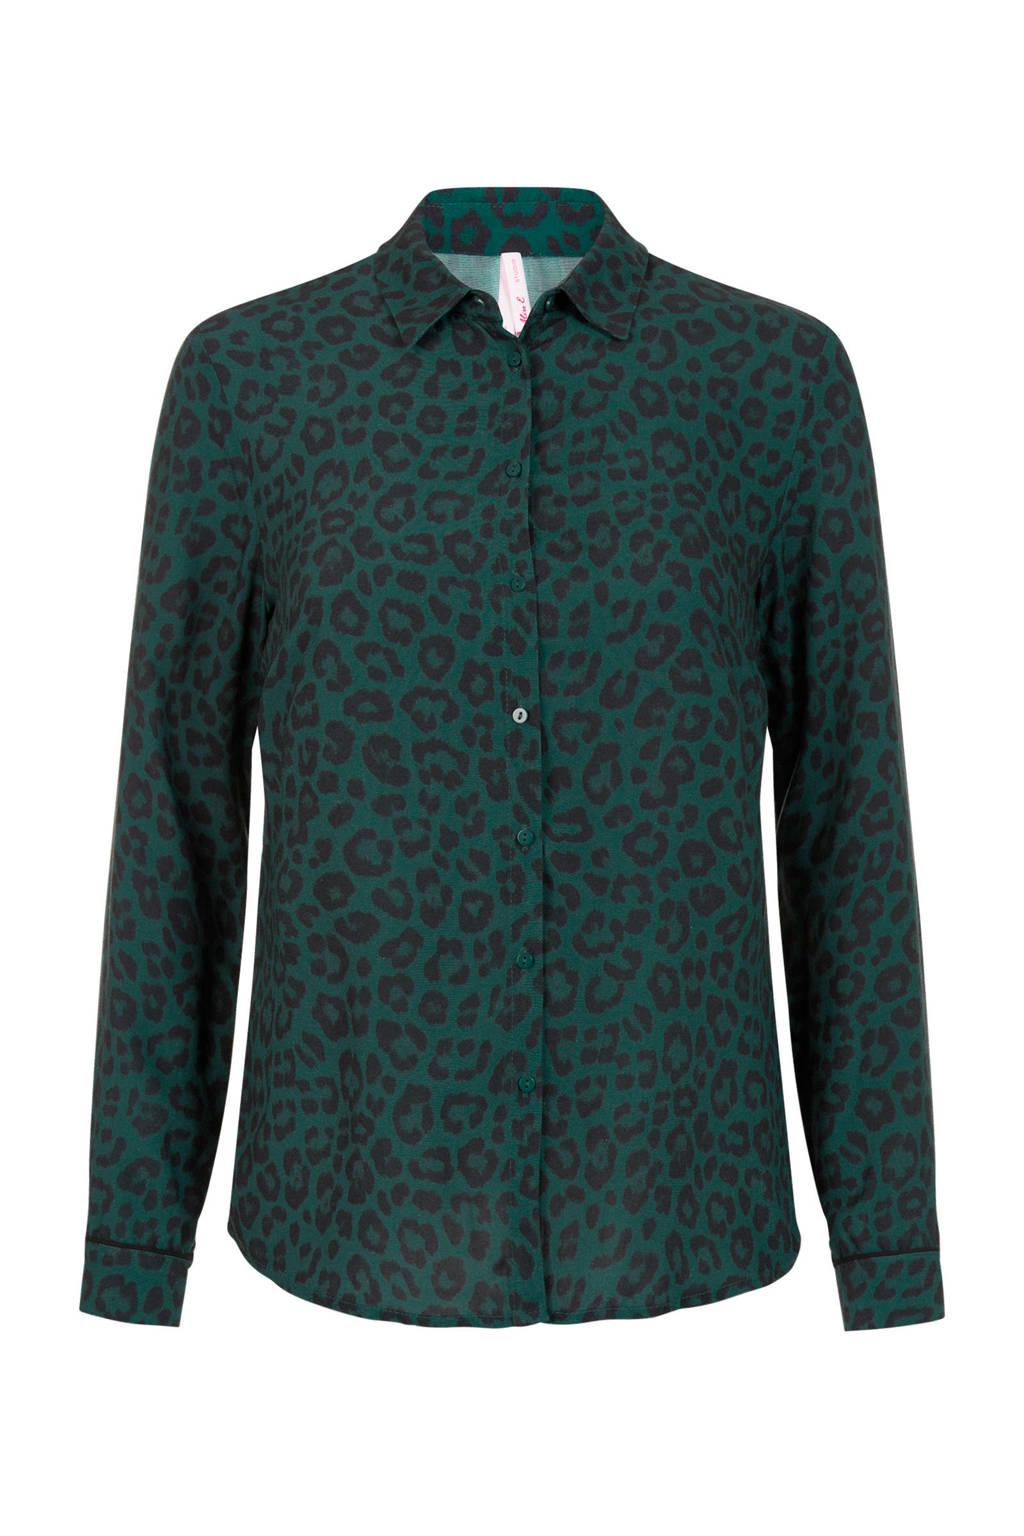 Miss Etam Regulier blouse met panterprint en contrastbies bruin, Donkergroen/zwart